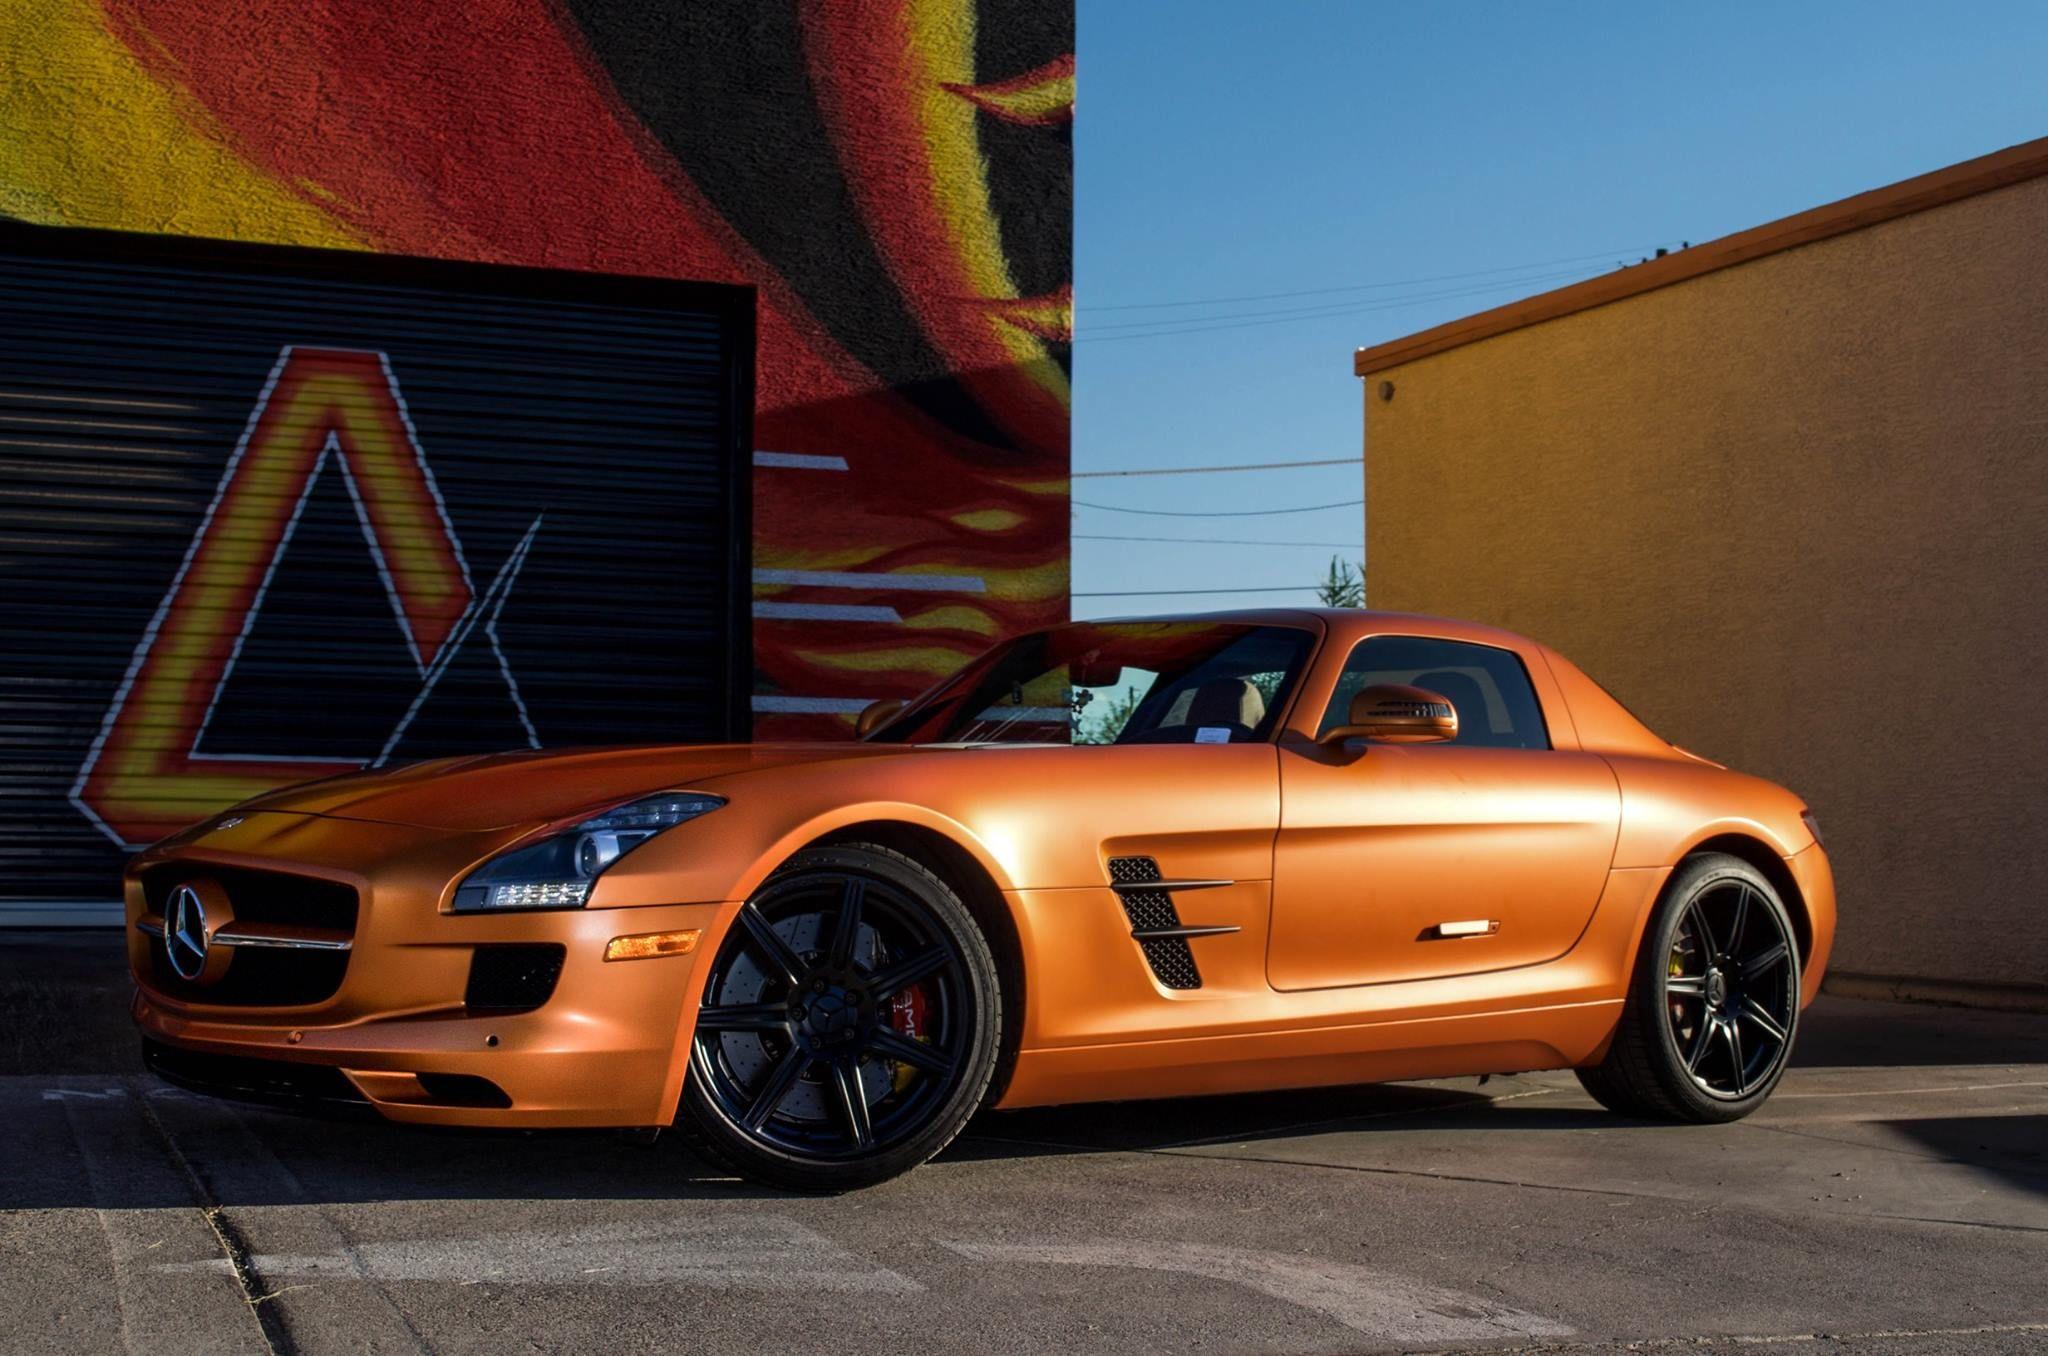 Mercedes Sls Amg 3m Satin Canyon Copper Orange Matte Black